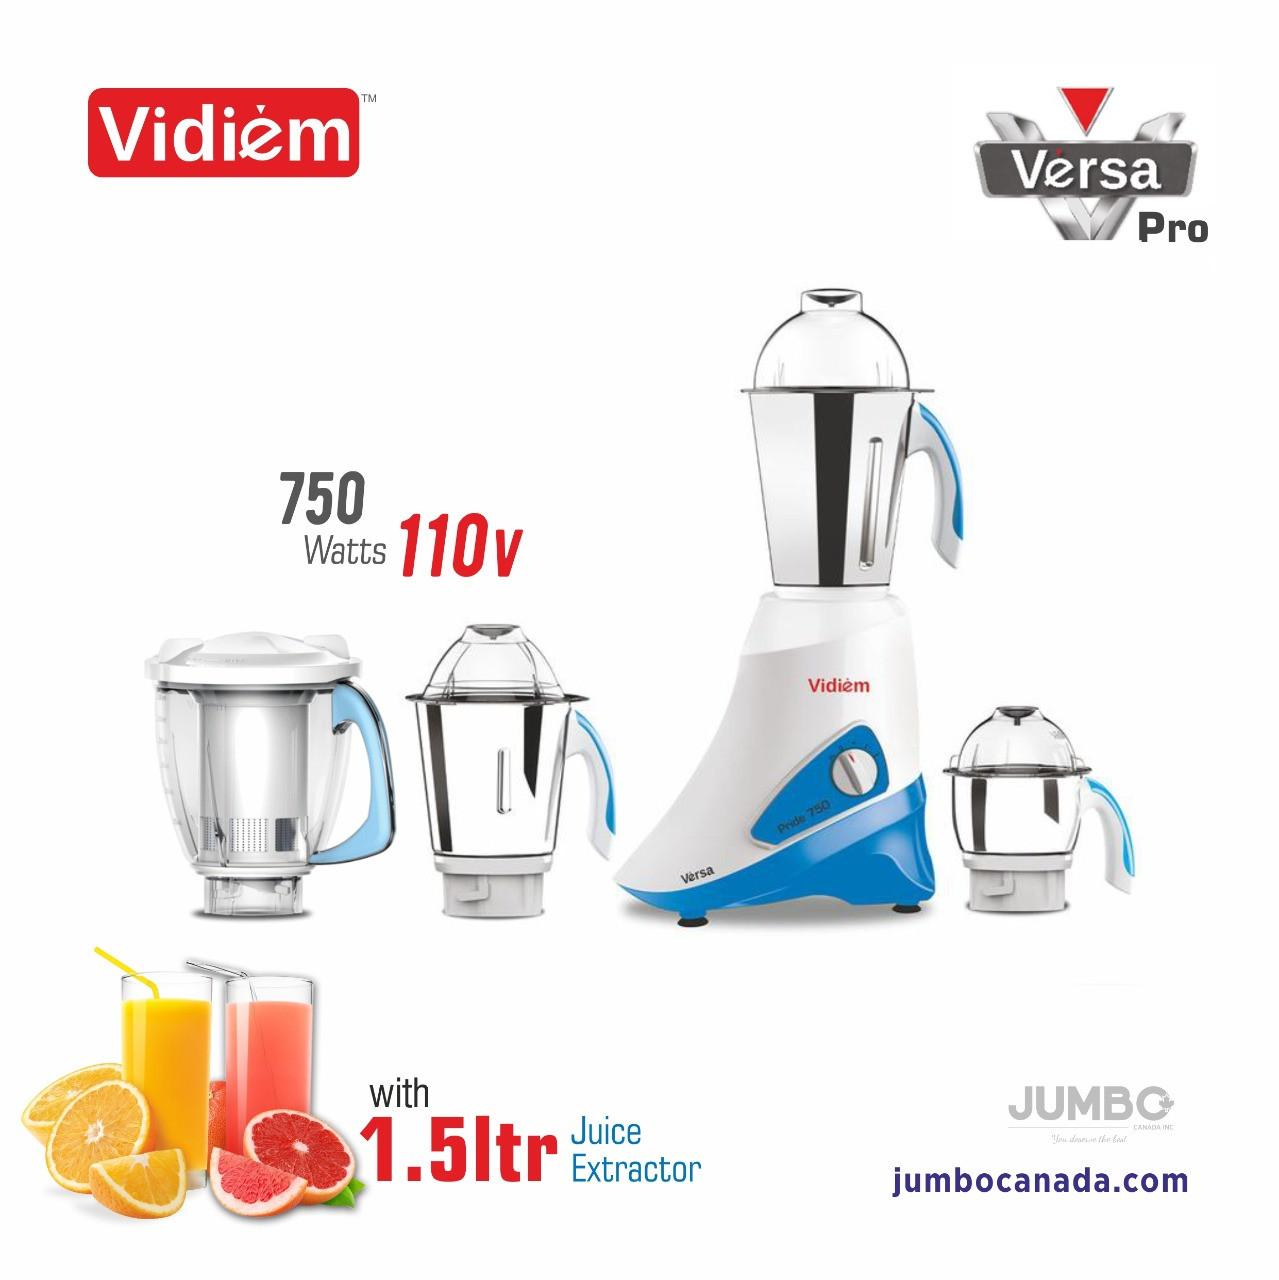 vidiem-versa-pro-750w-with-juice-extractor